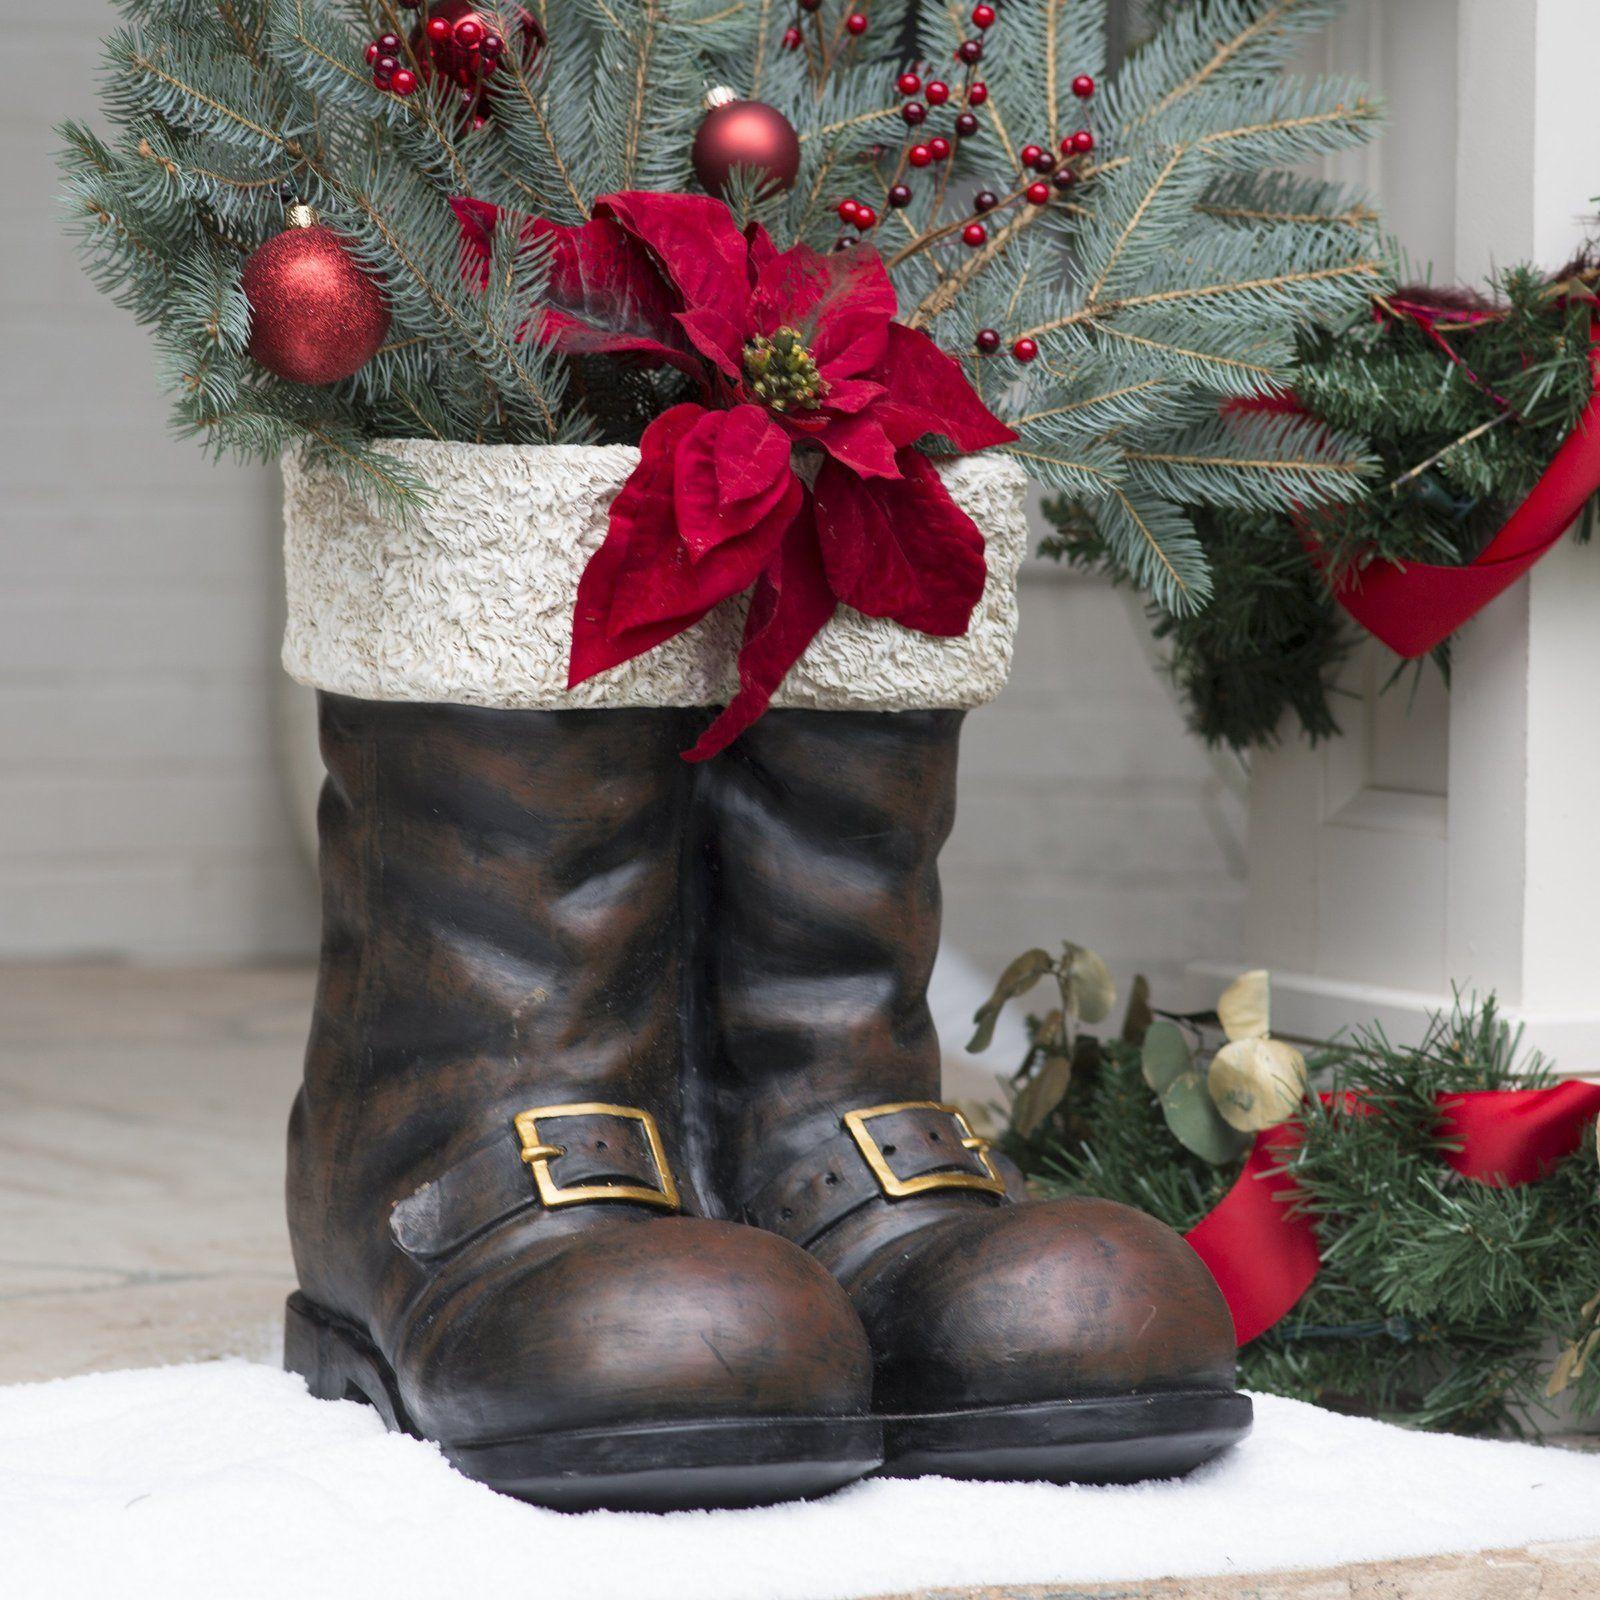 Santa Boots Claus Costume Christmas Home Decor Antiqued Brown Gold New Description A Perfect Seasonal Touch Santa Boots Christmas Boots Grey Christmas Decor